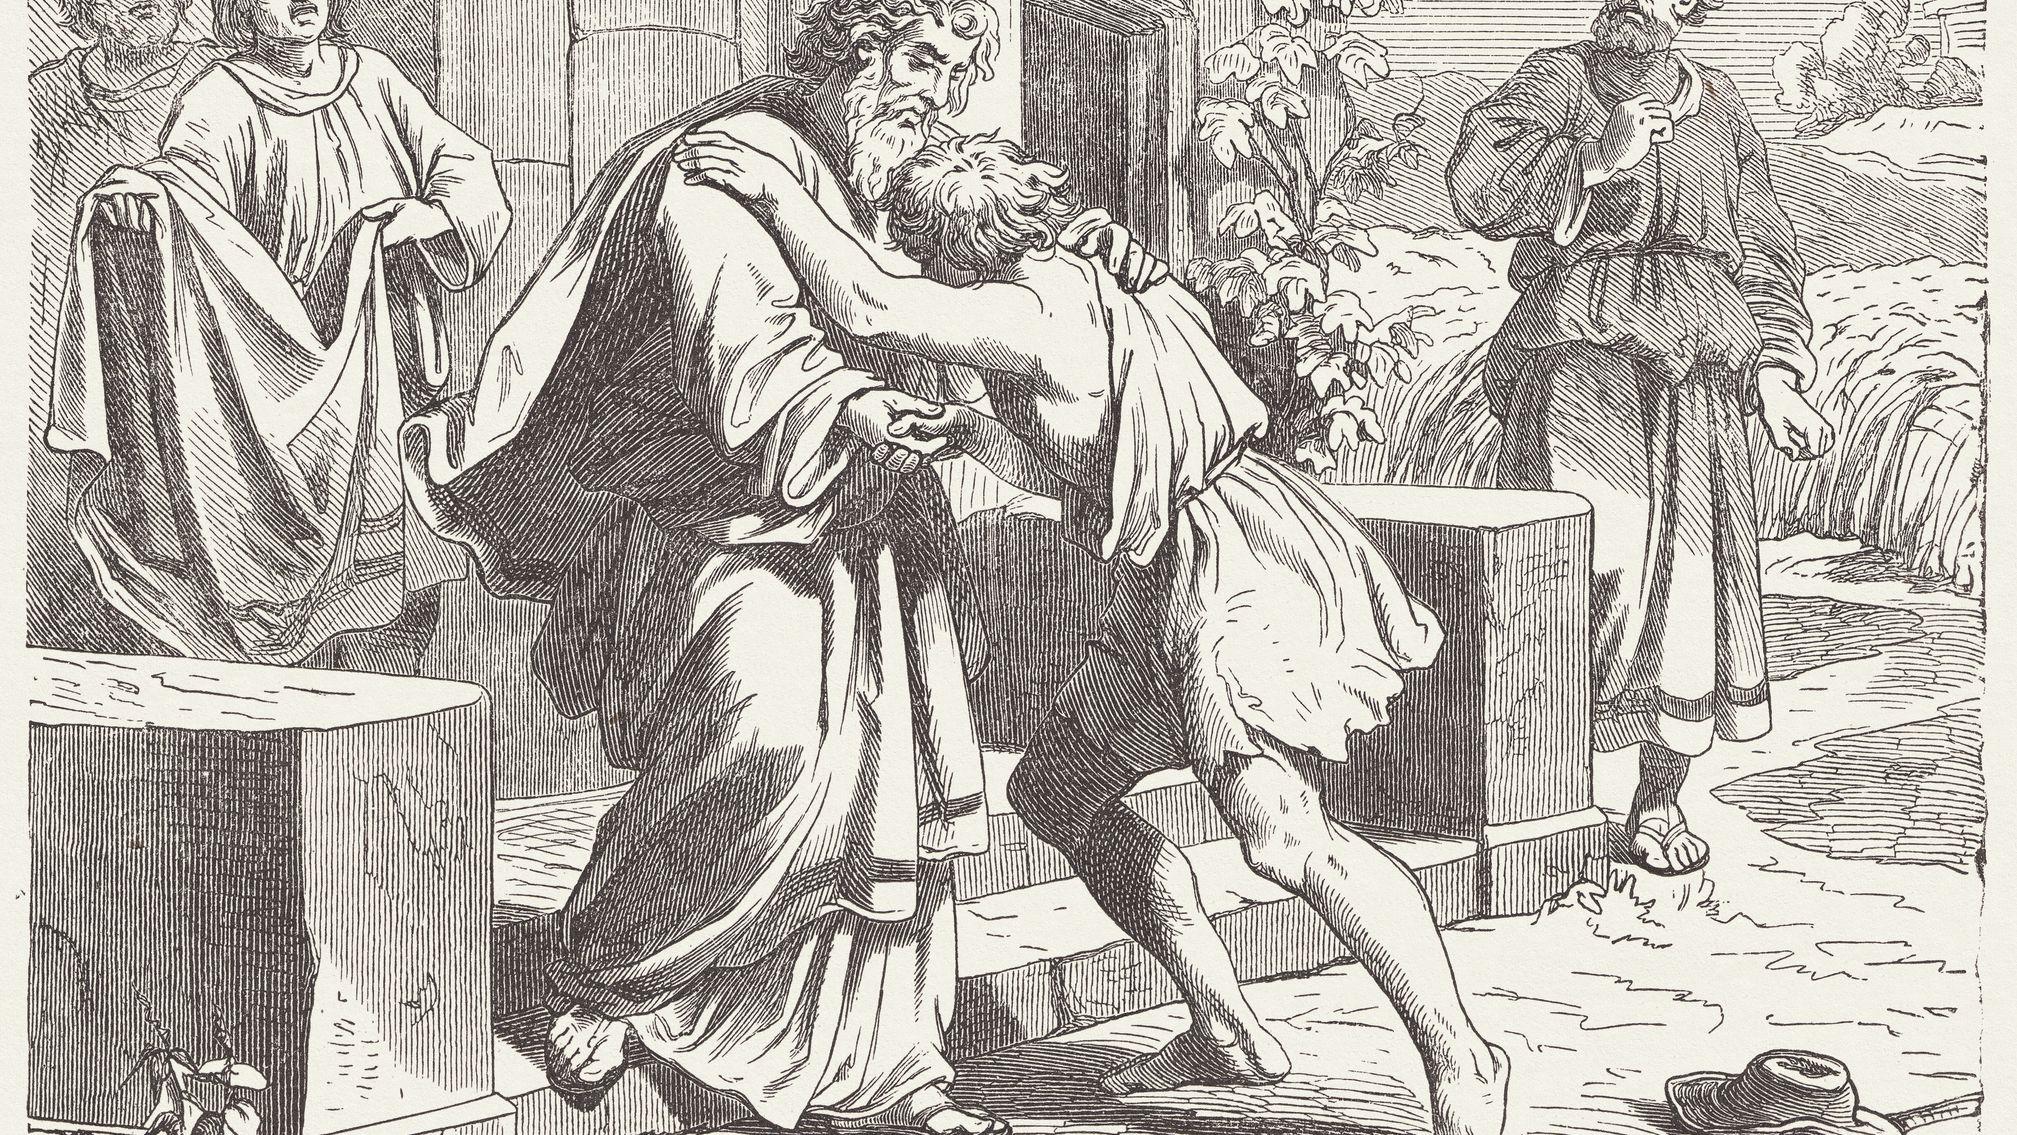 Prodigal Son Bible Story Summary Of Luke 15 11 32